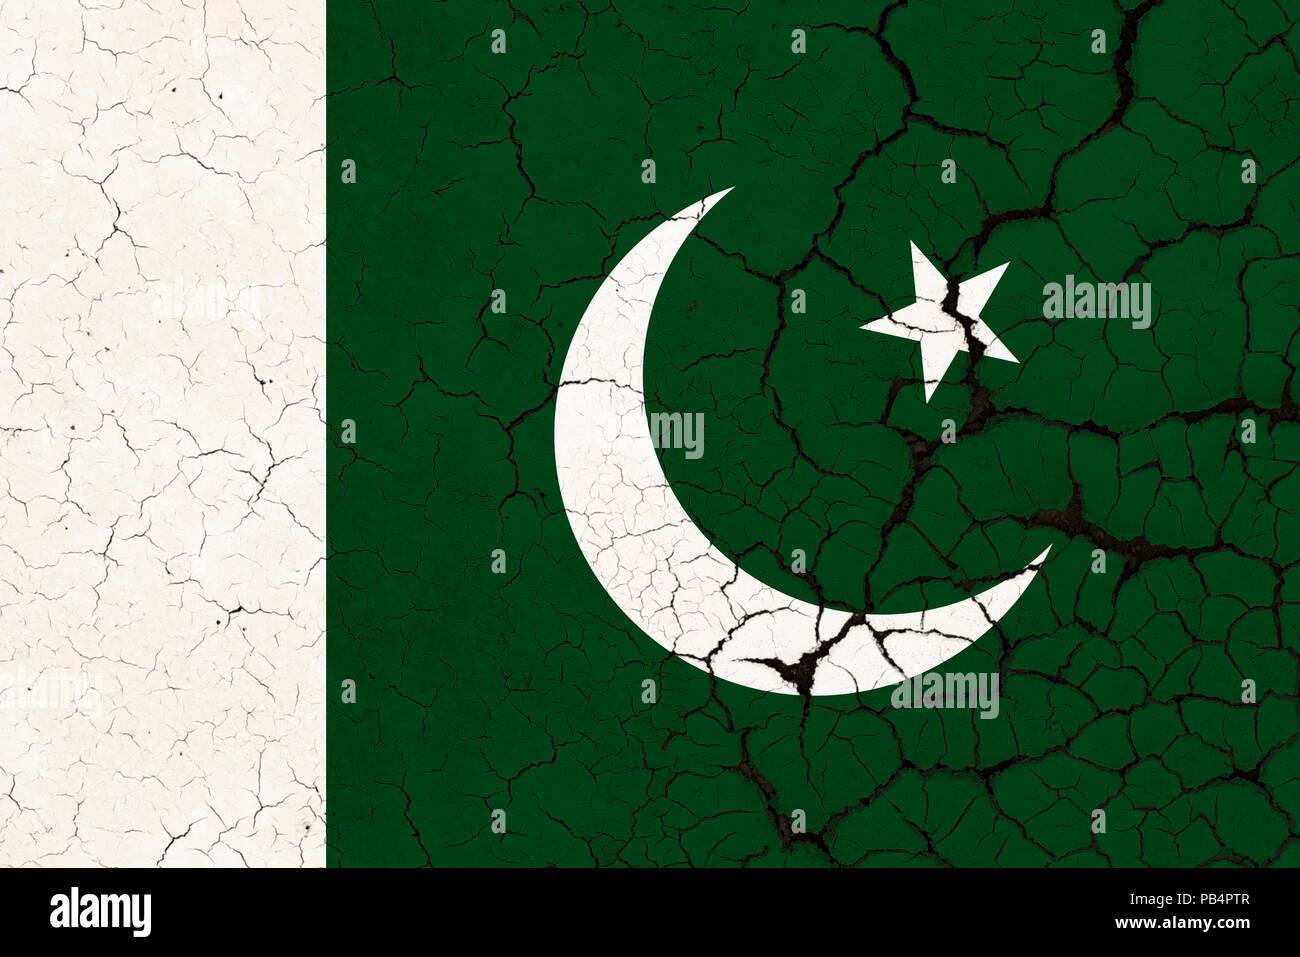 A Cracked And Fragile Pakistani Flag - Stock Image